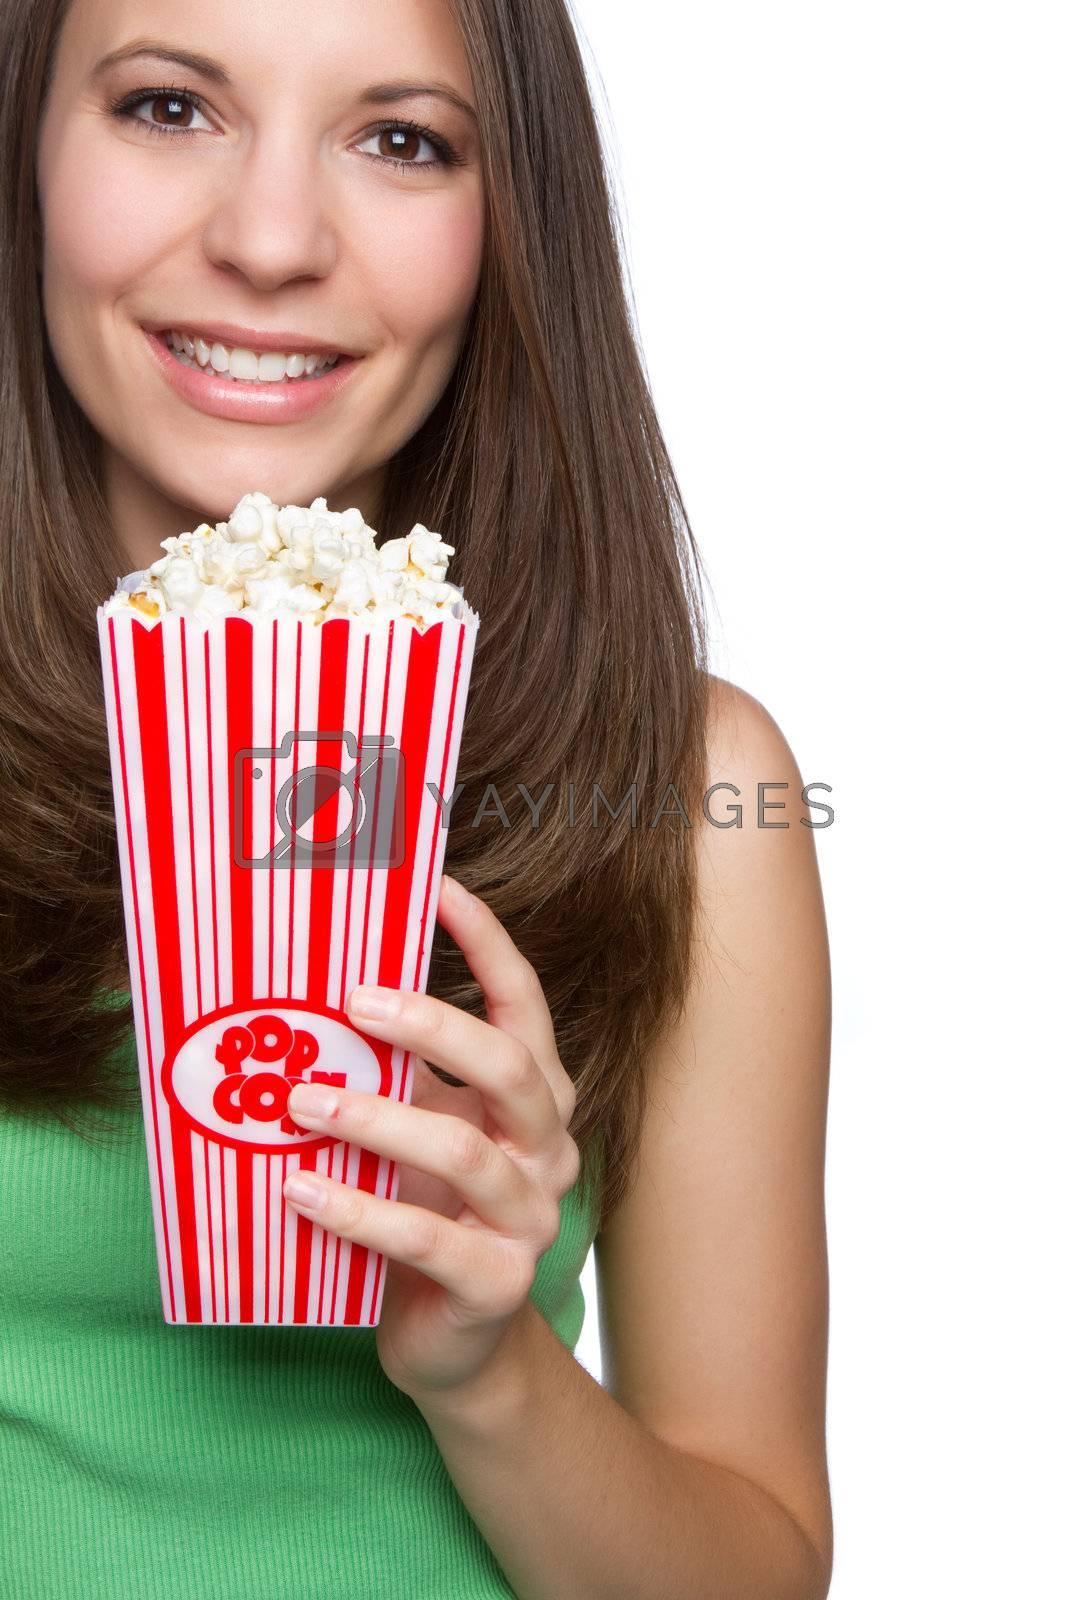 Beautiful teen girl eating popcorn